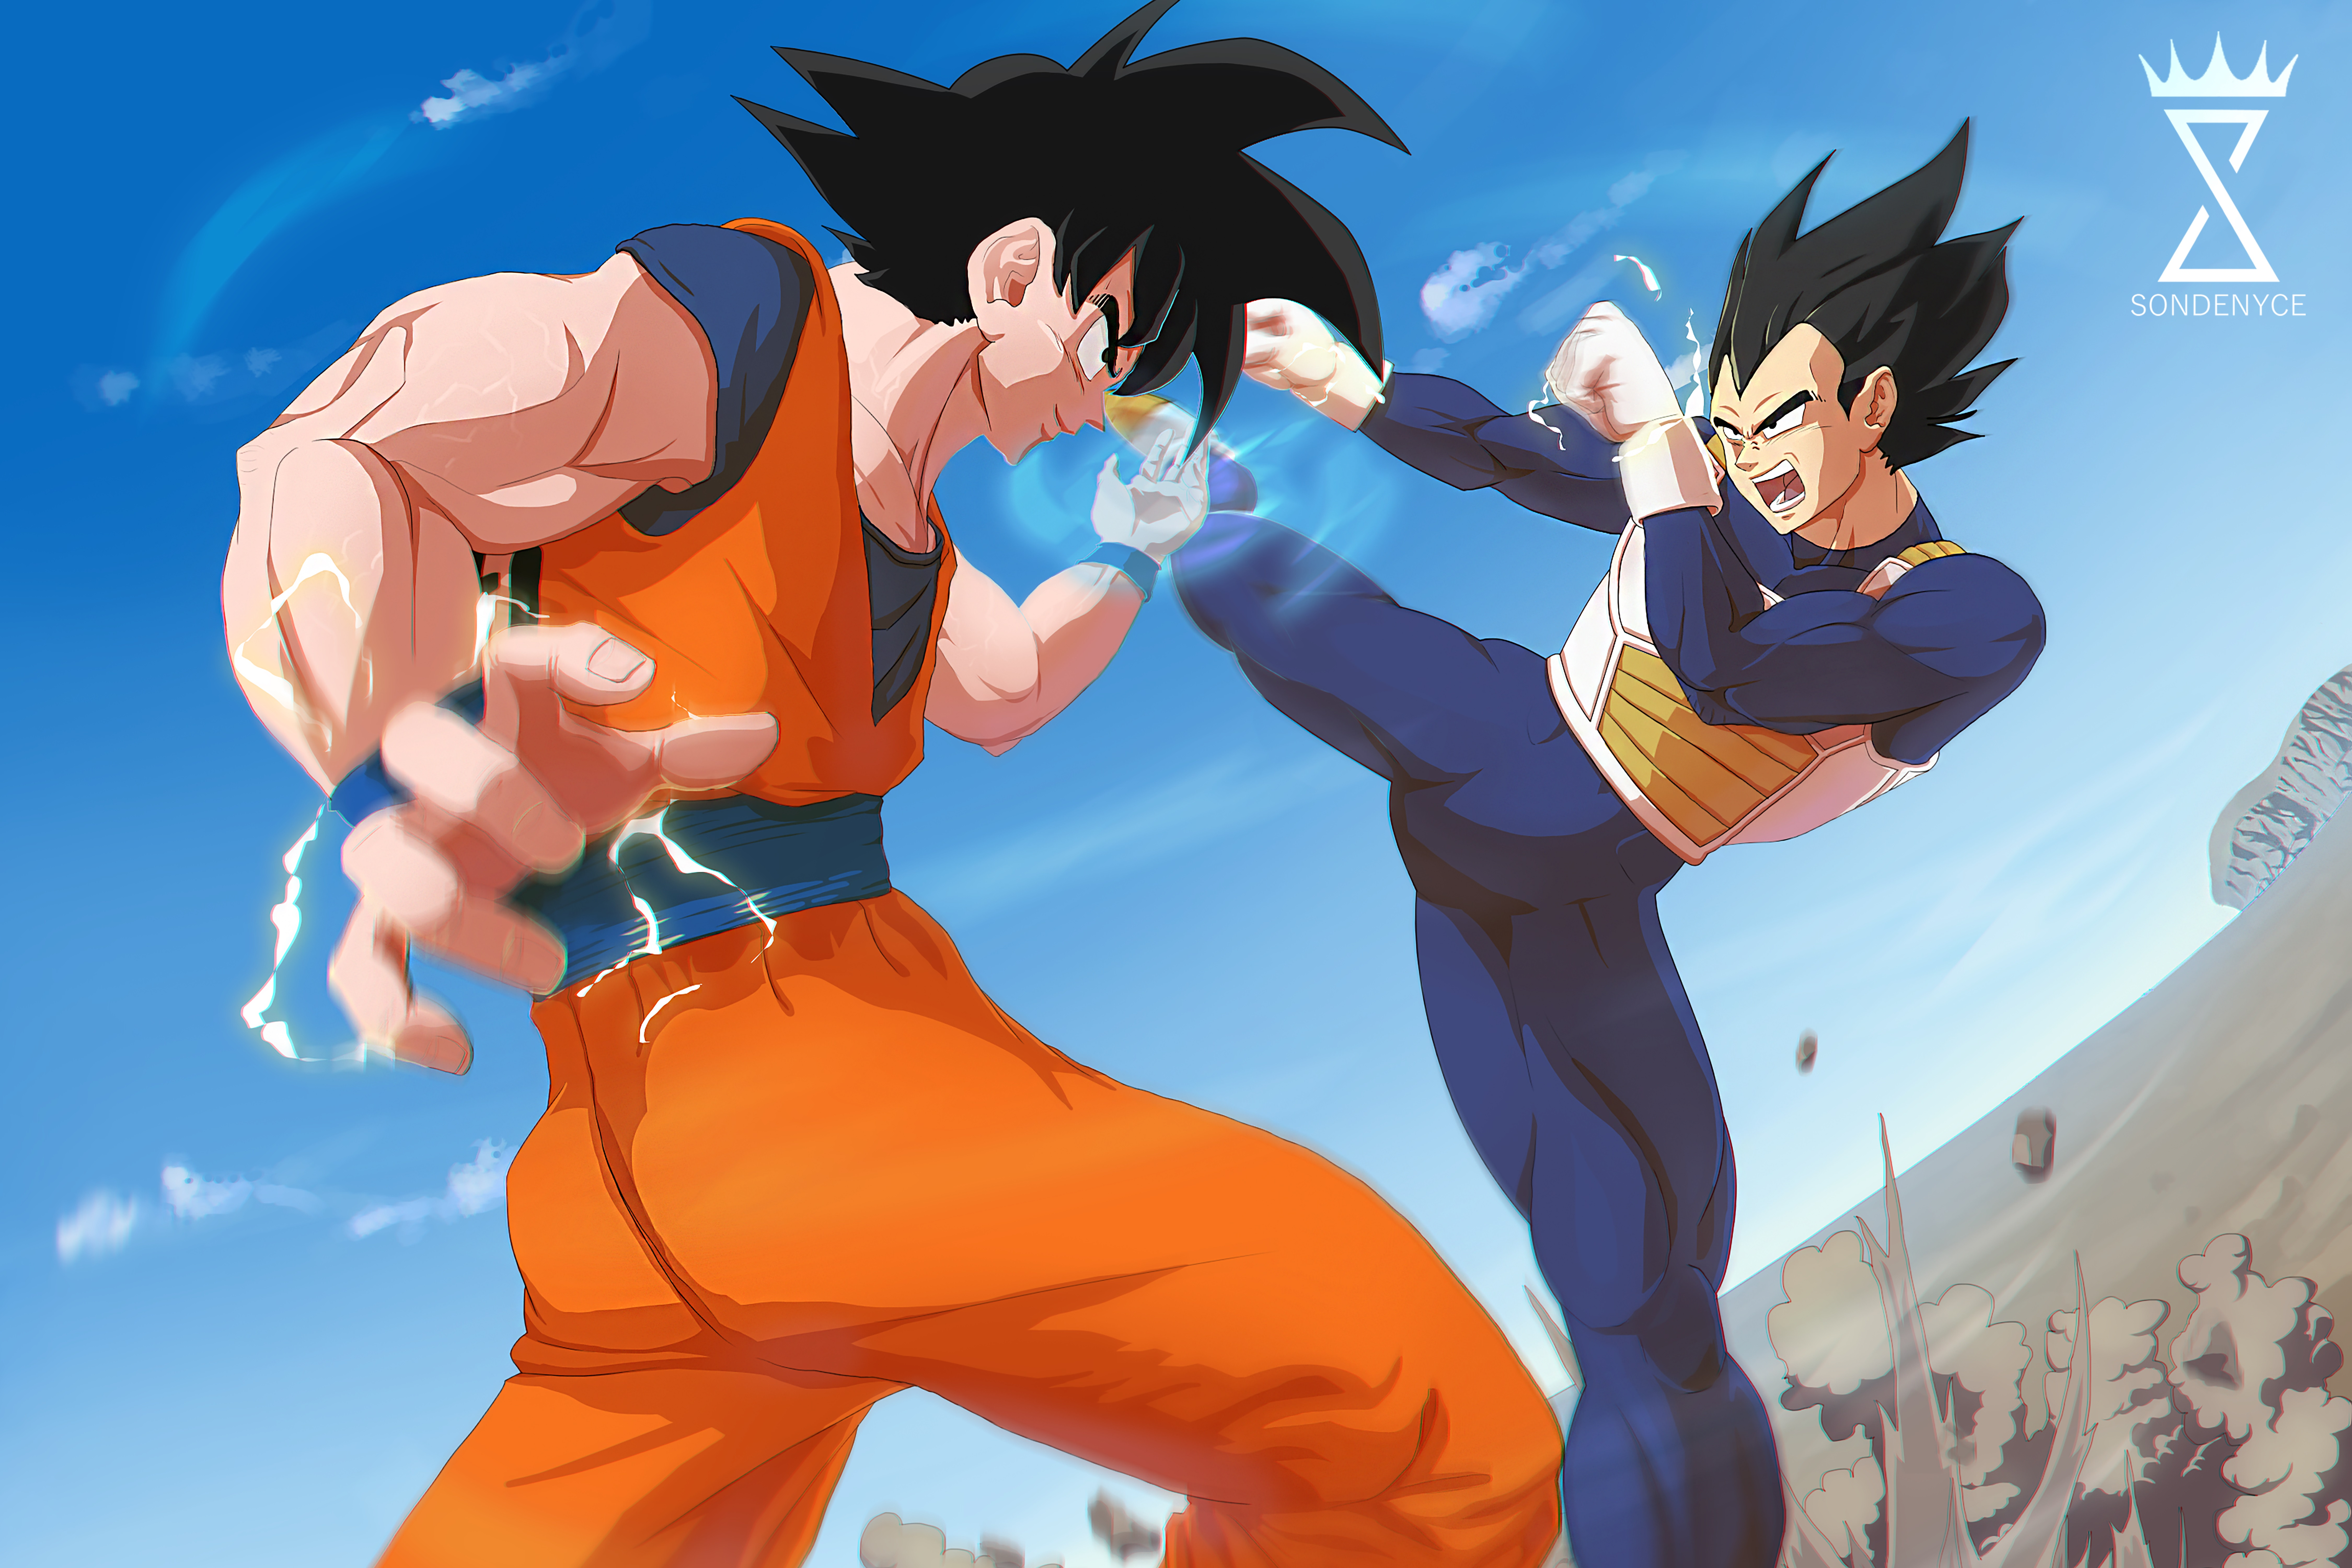 Goku Vs Vegeta 8k Ultra Hd Wallpaper Background Image 9000x6000 Id 1012361 Wallpaper Abyss